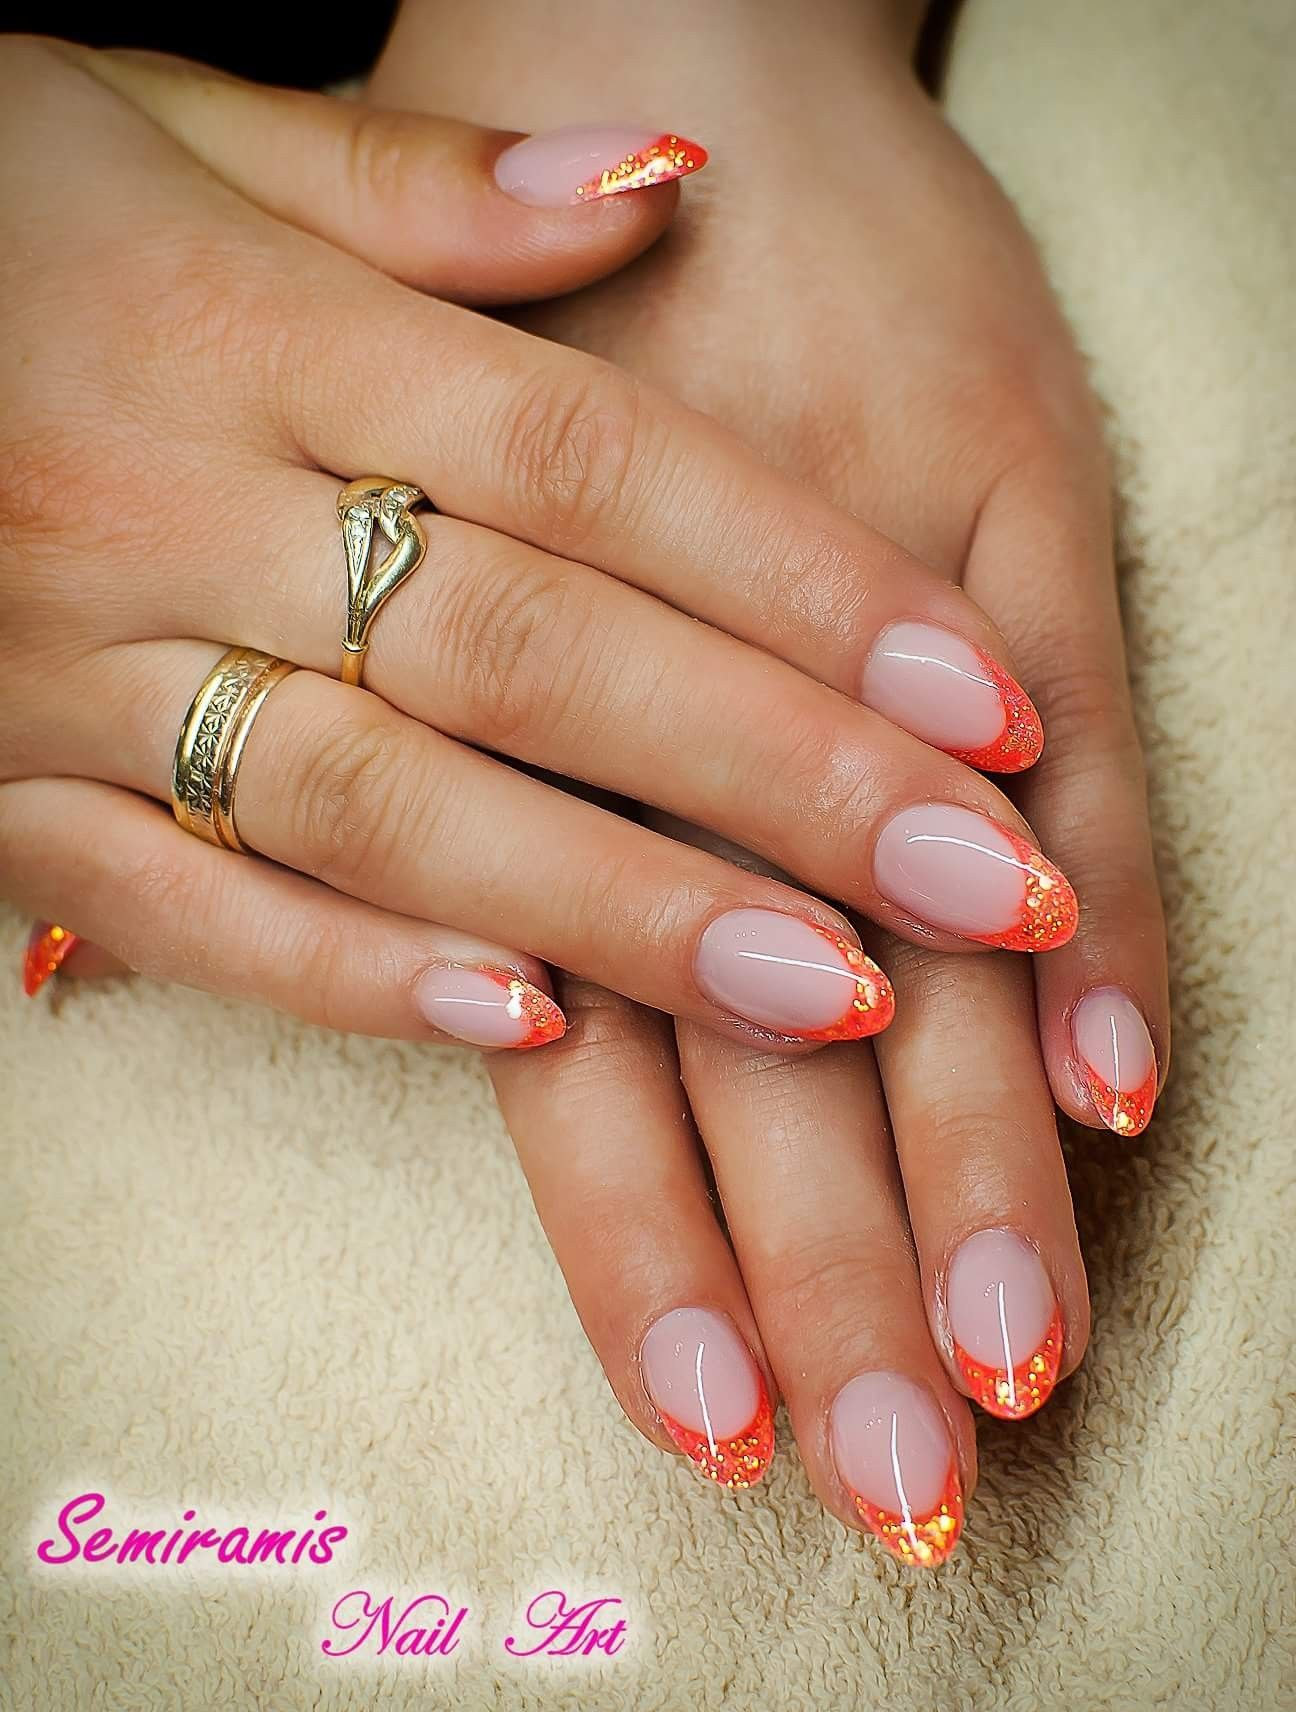 French nails, shining orange free edge | köröm minták / Nail Art ...